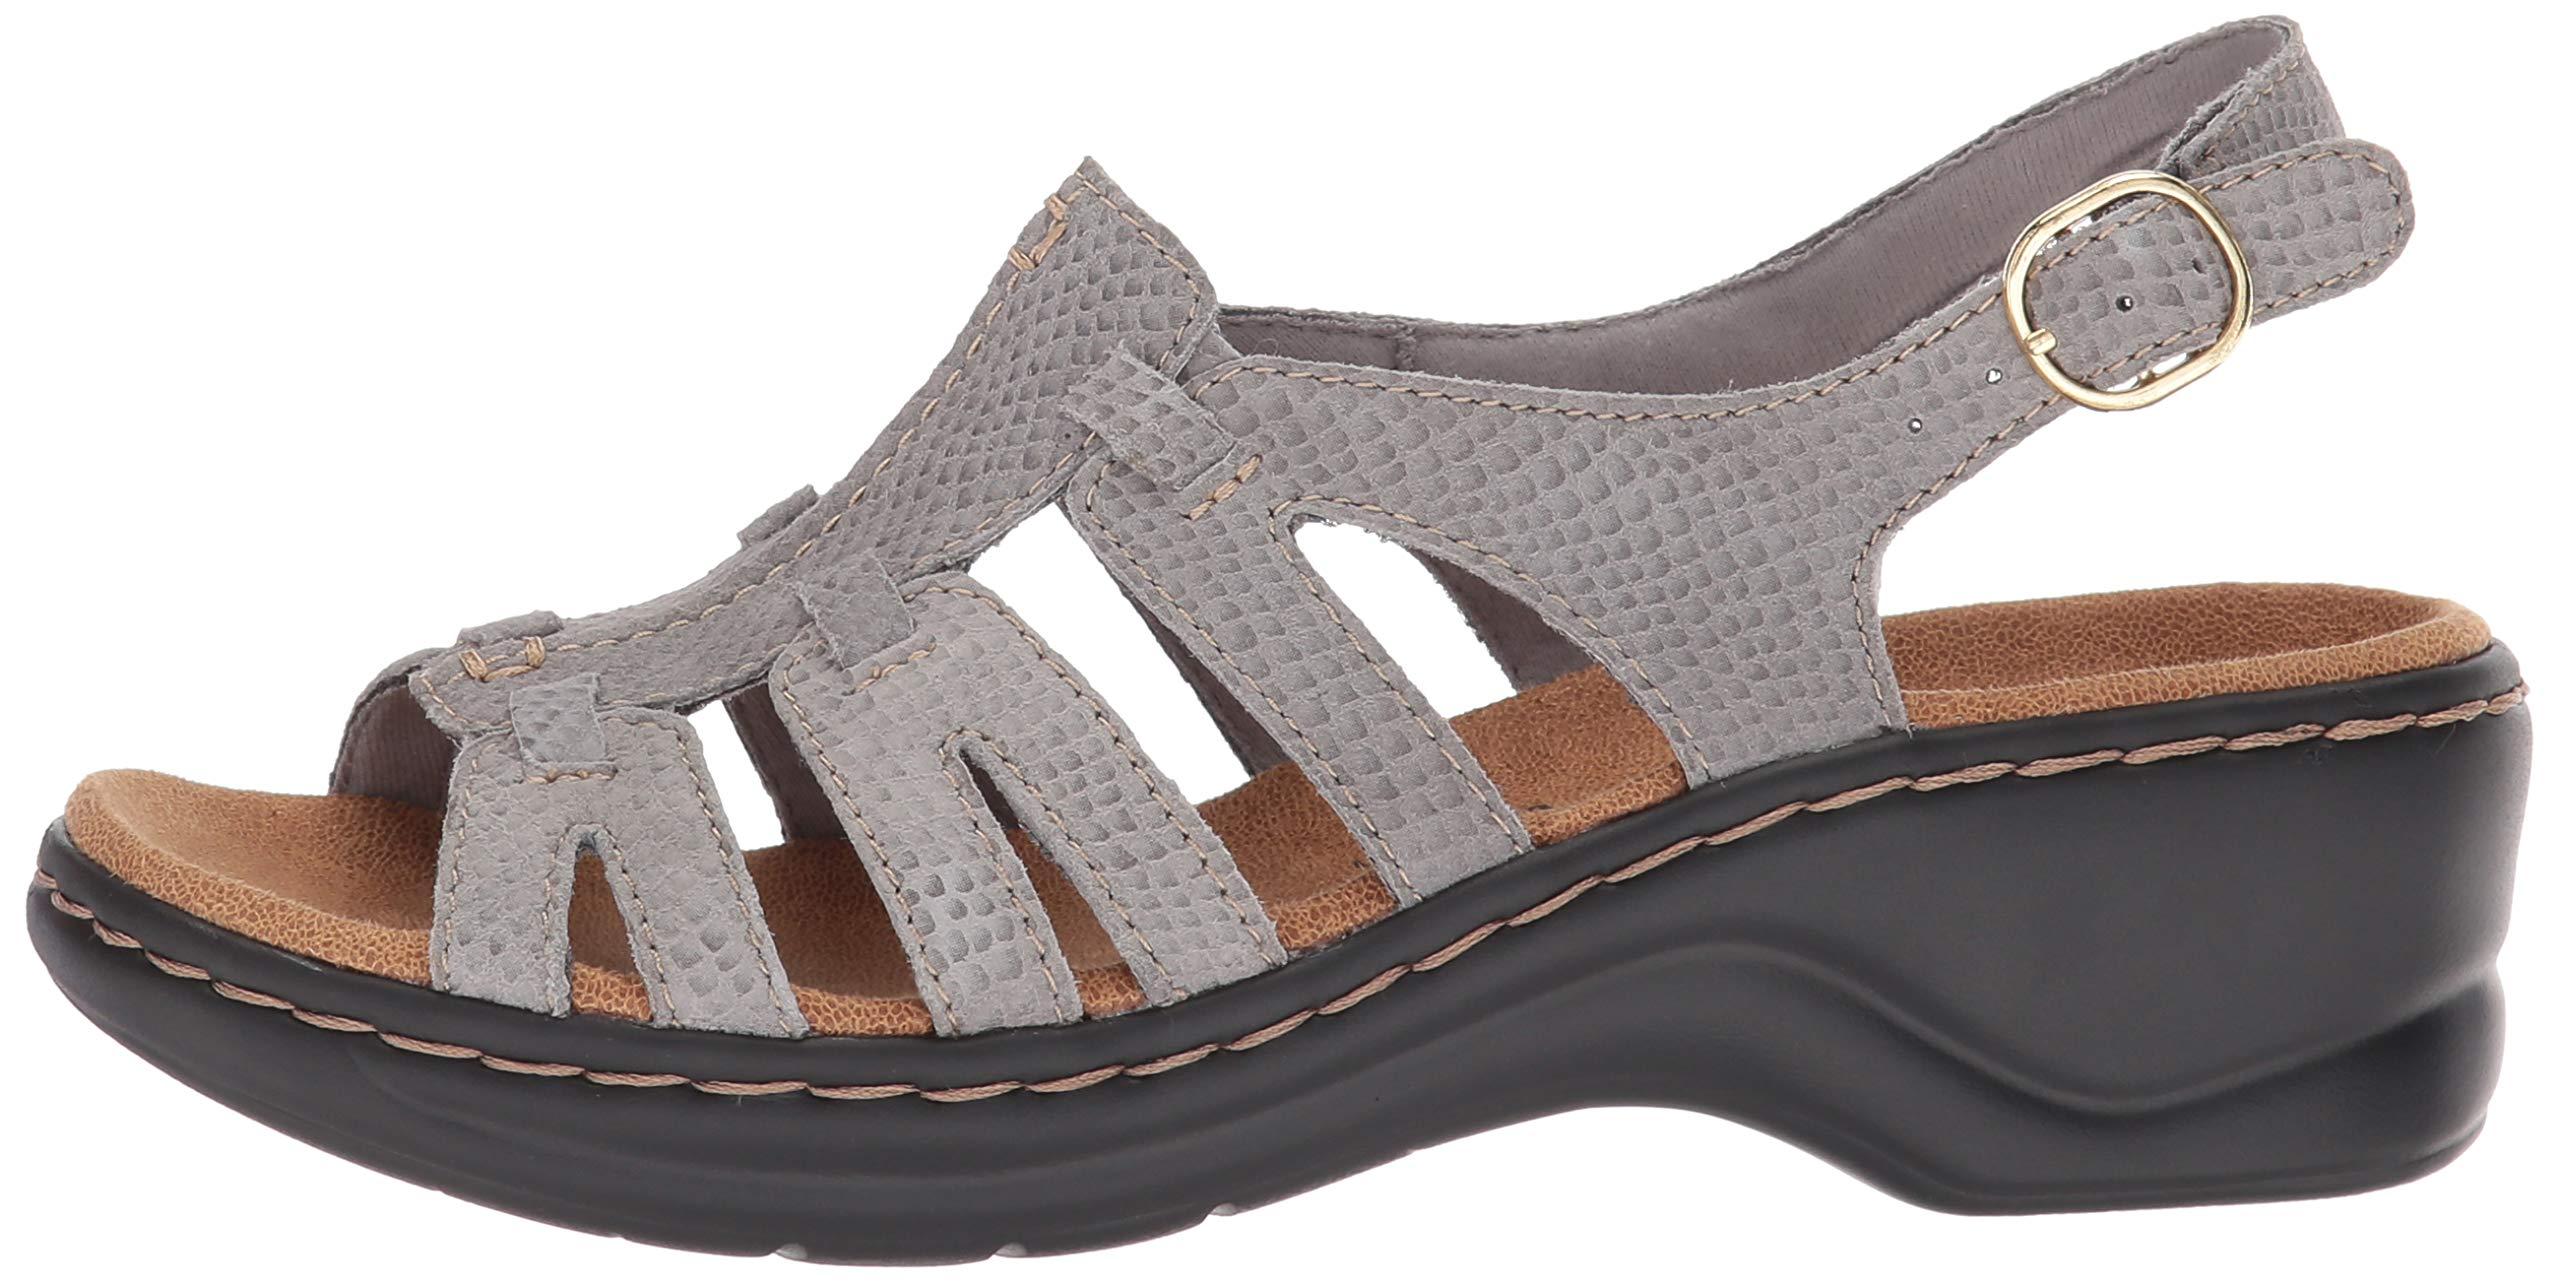 Women/'s Lexi Marigold Q gris clair Snake Print Platform Sandal Clarks 26134189